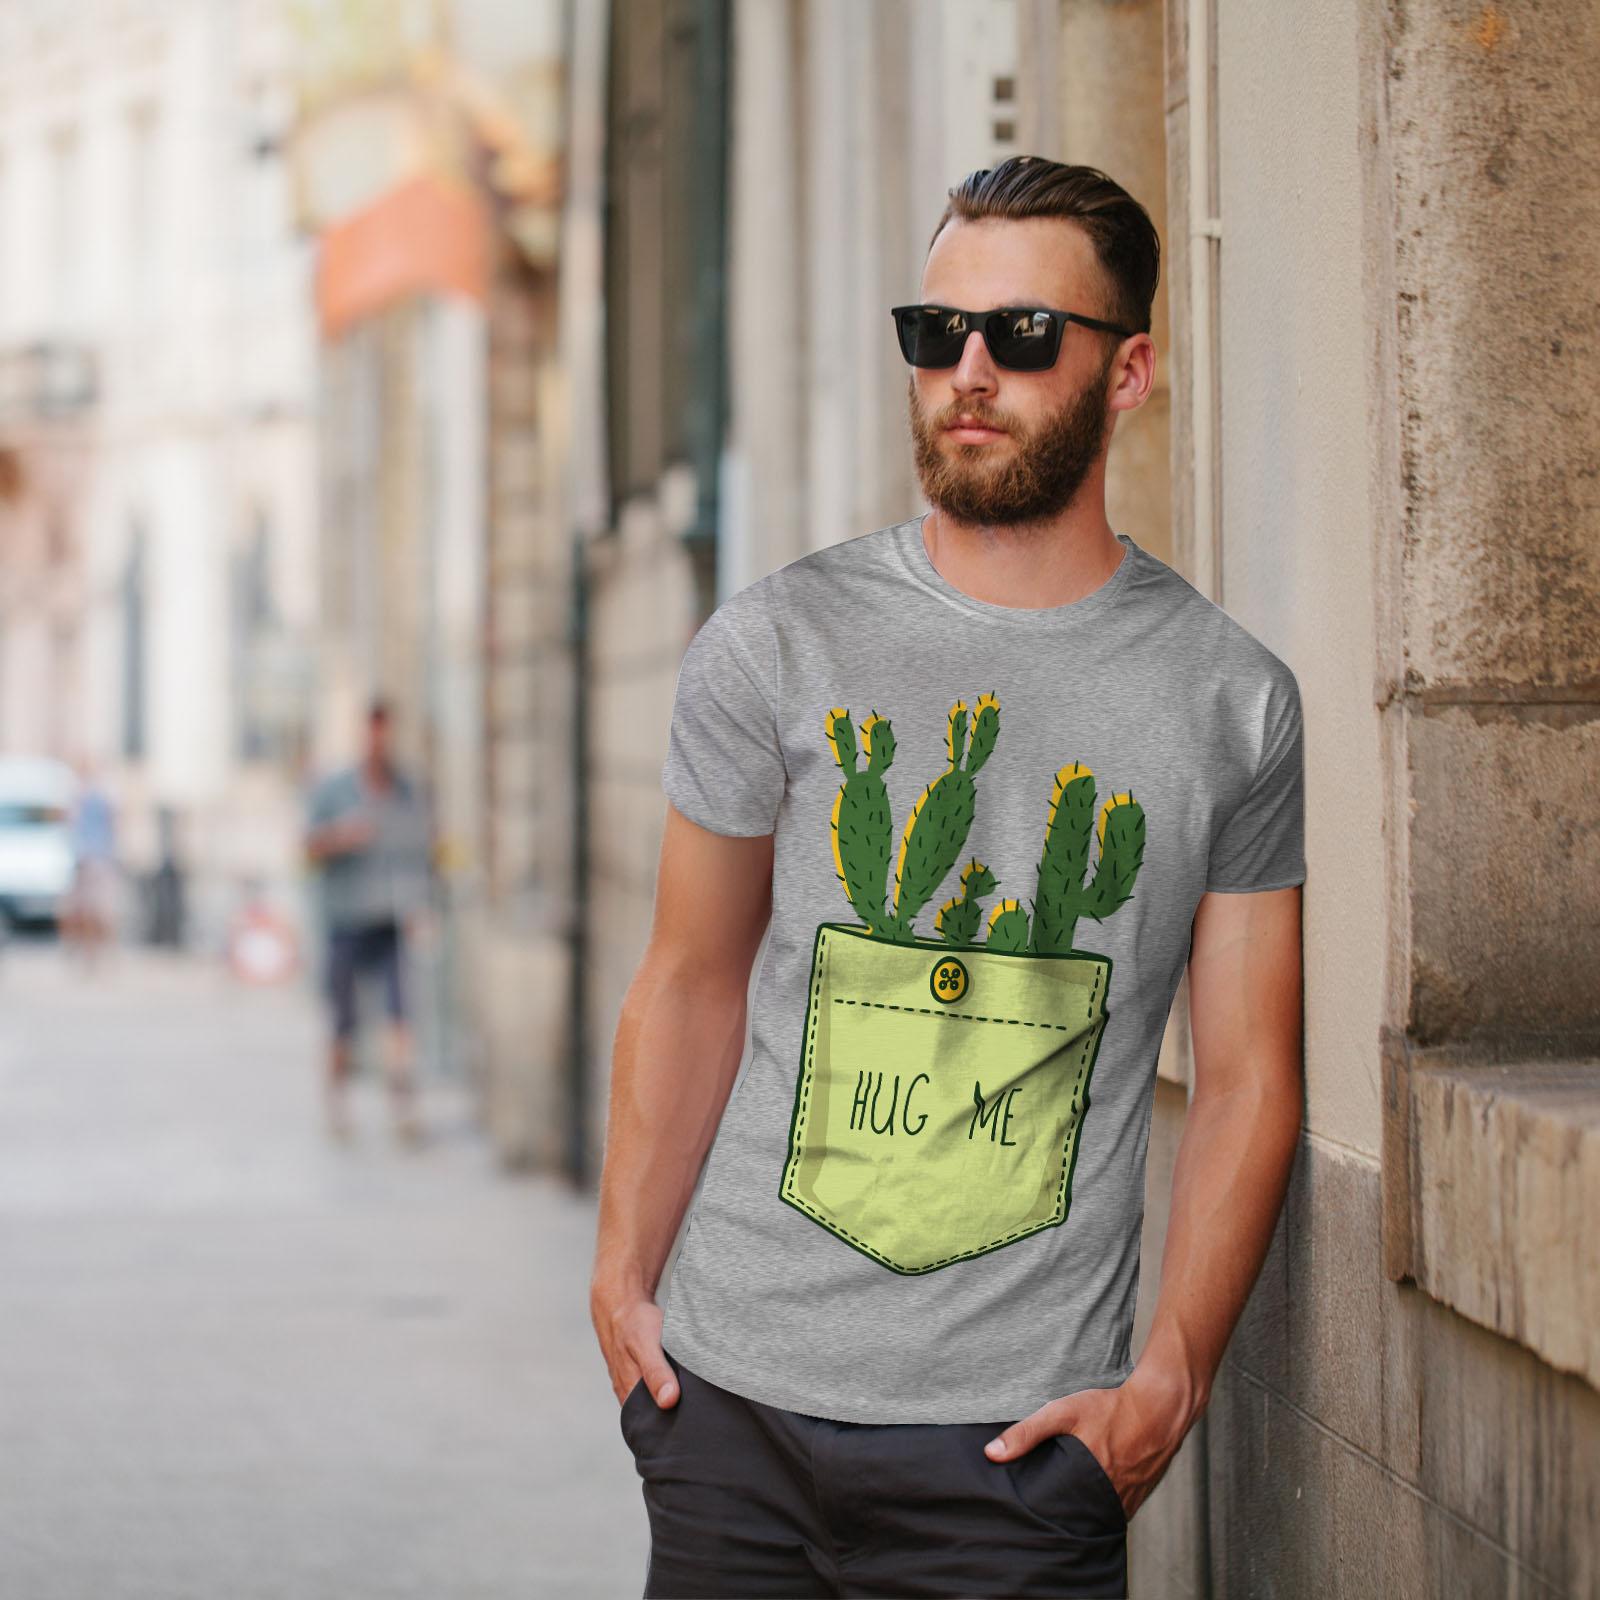 miniature 17 - Wellcoda Hug Me Cactus Funny Mens T-shirt,  Graphic Design Printed Tee